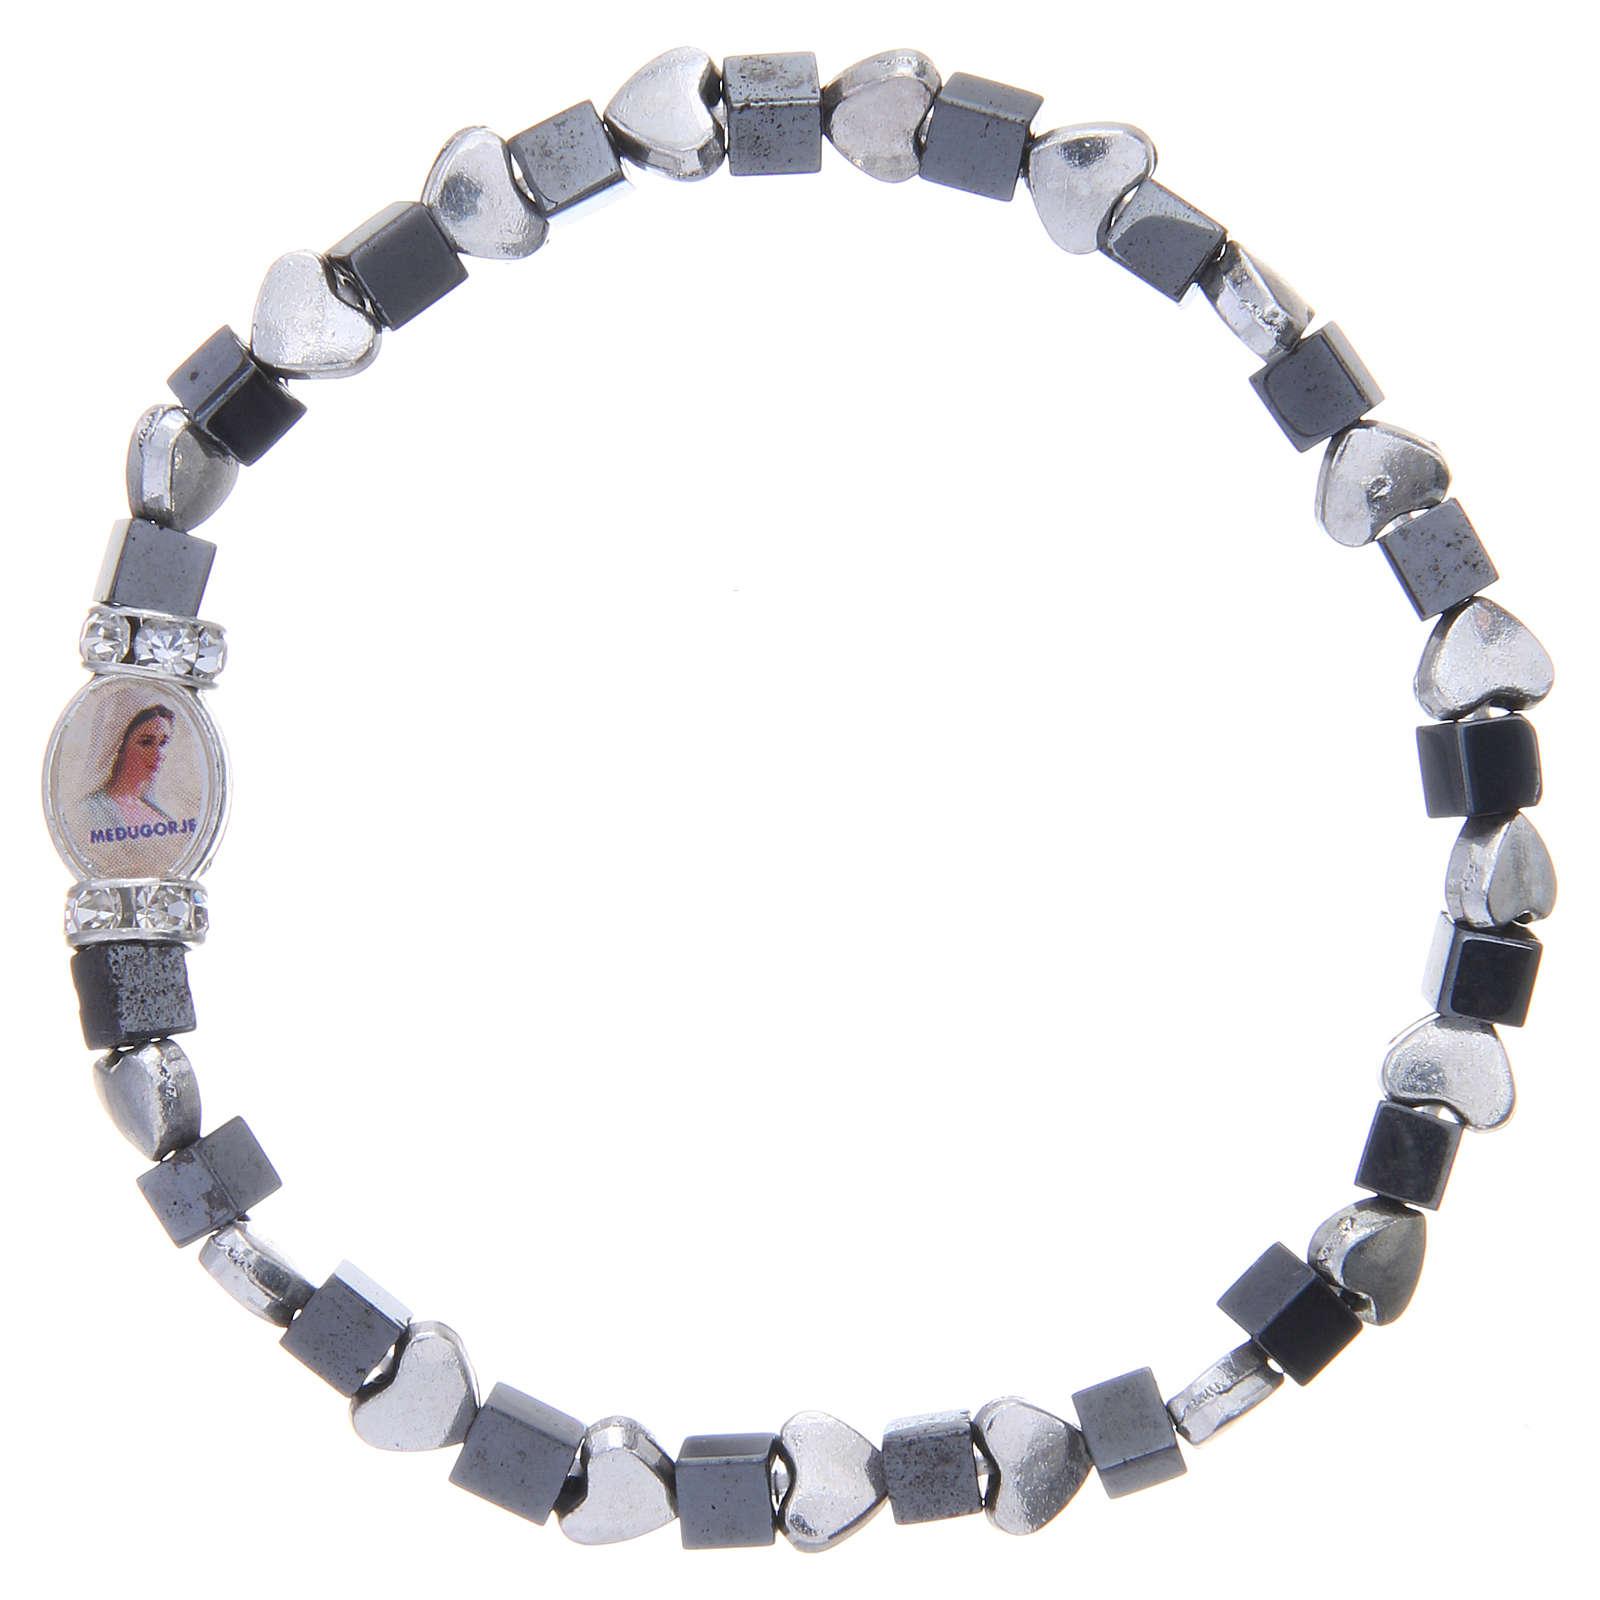 Medjugorje bracelet, black haematite with hearts 4